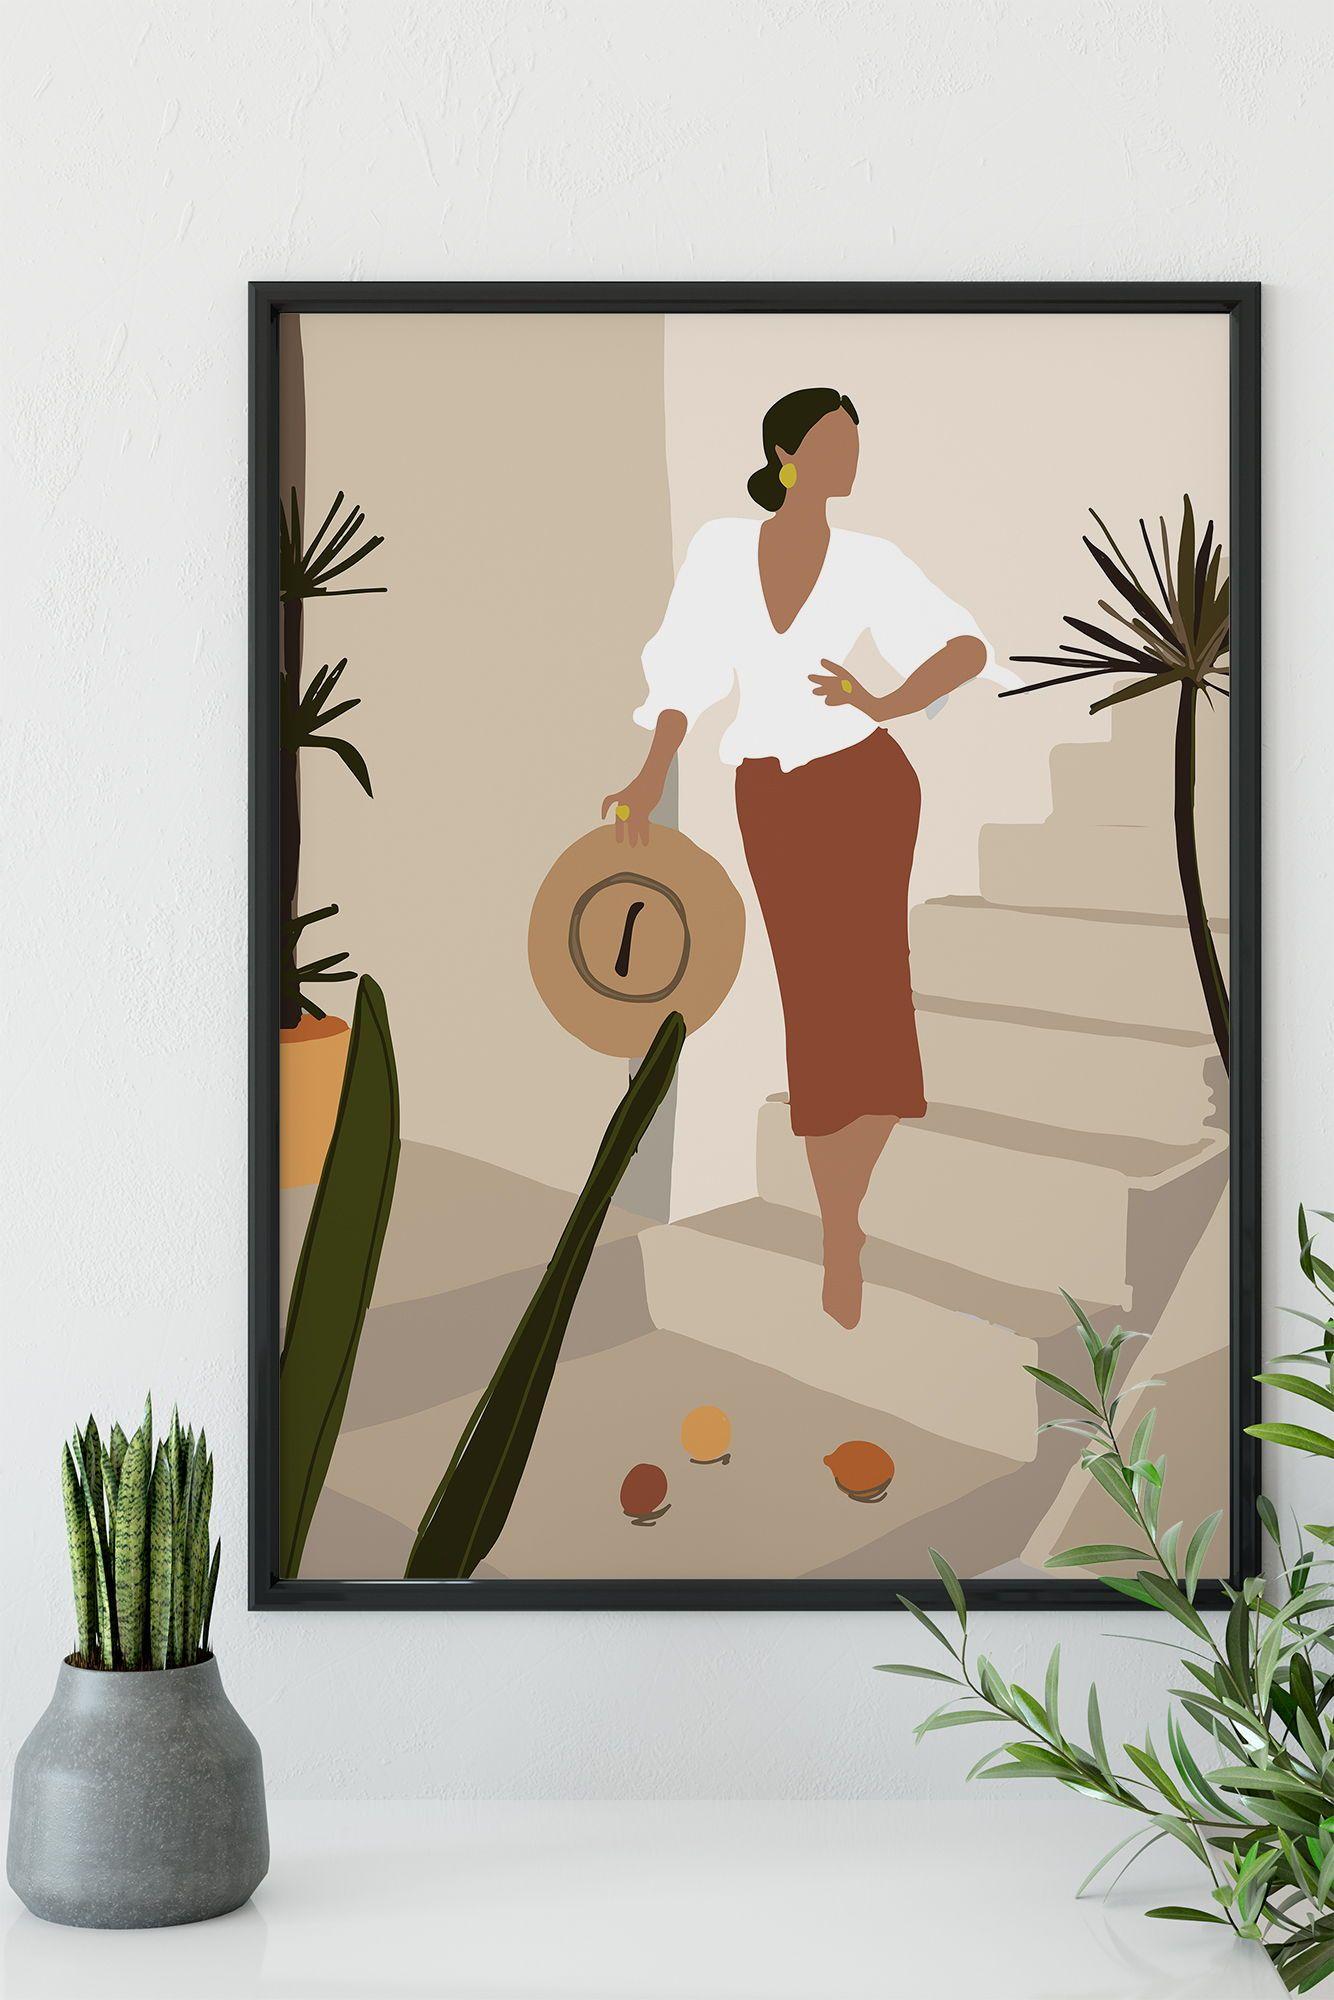 Abstract Female Portrait Wall Art Print Mid Century Modern Etsy In 2021 Wall Art Prints Wall Art Canvas Art Wall Decor